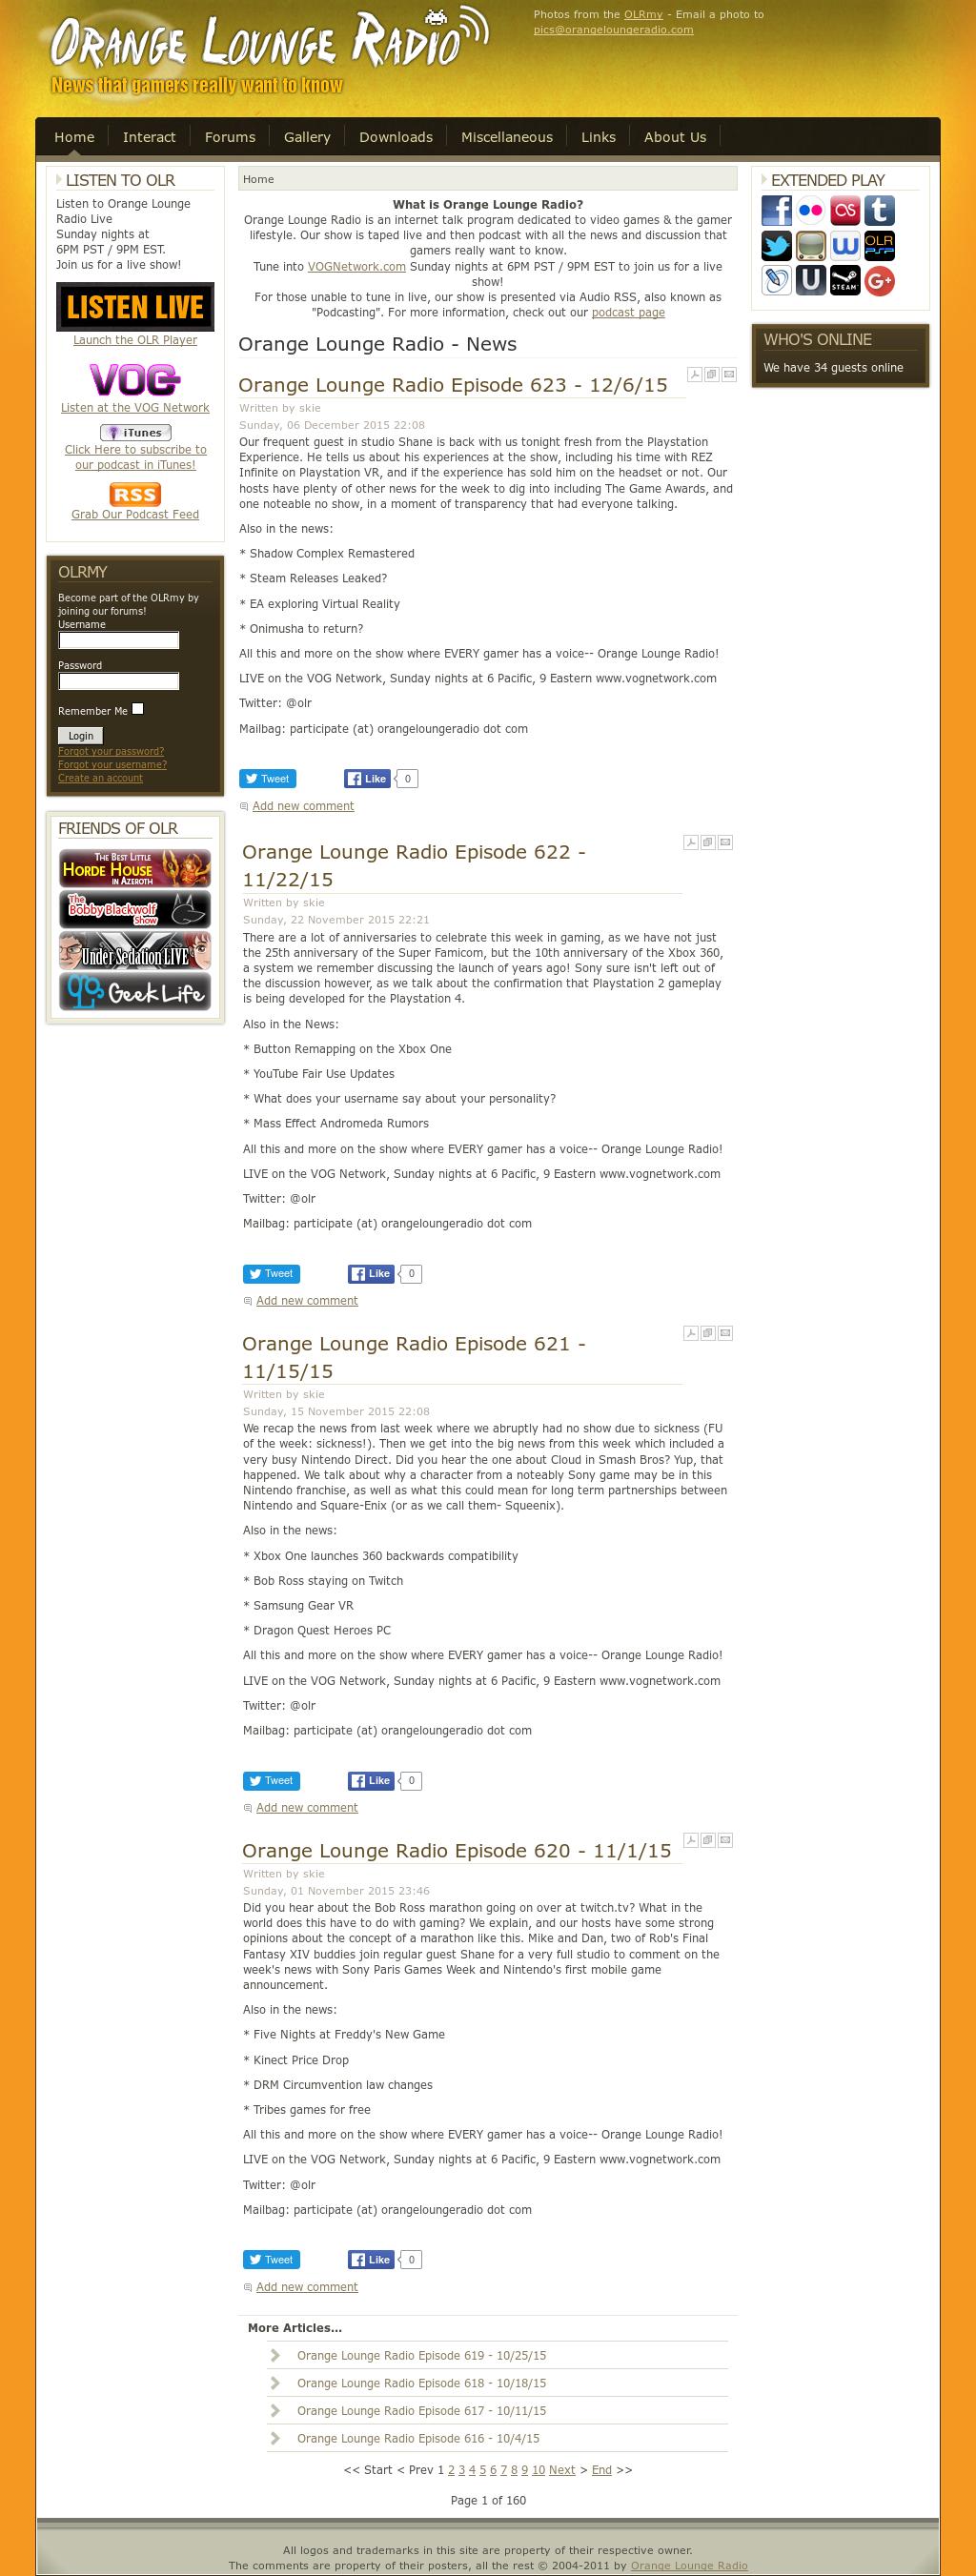 Orange Lounge Radio Competitors, Revenue and Employees - Owler